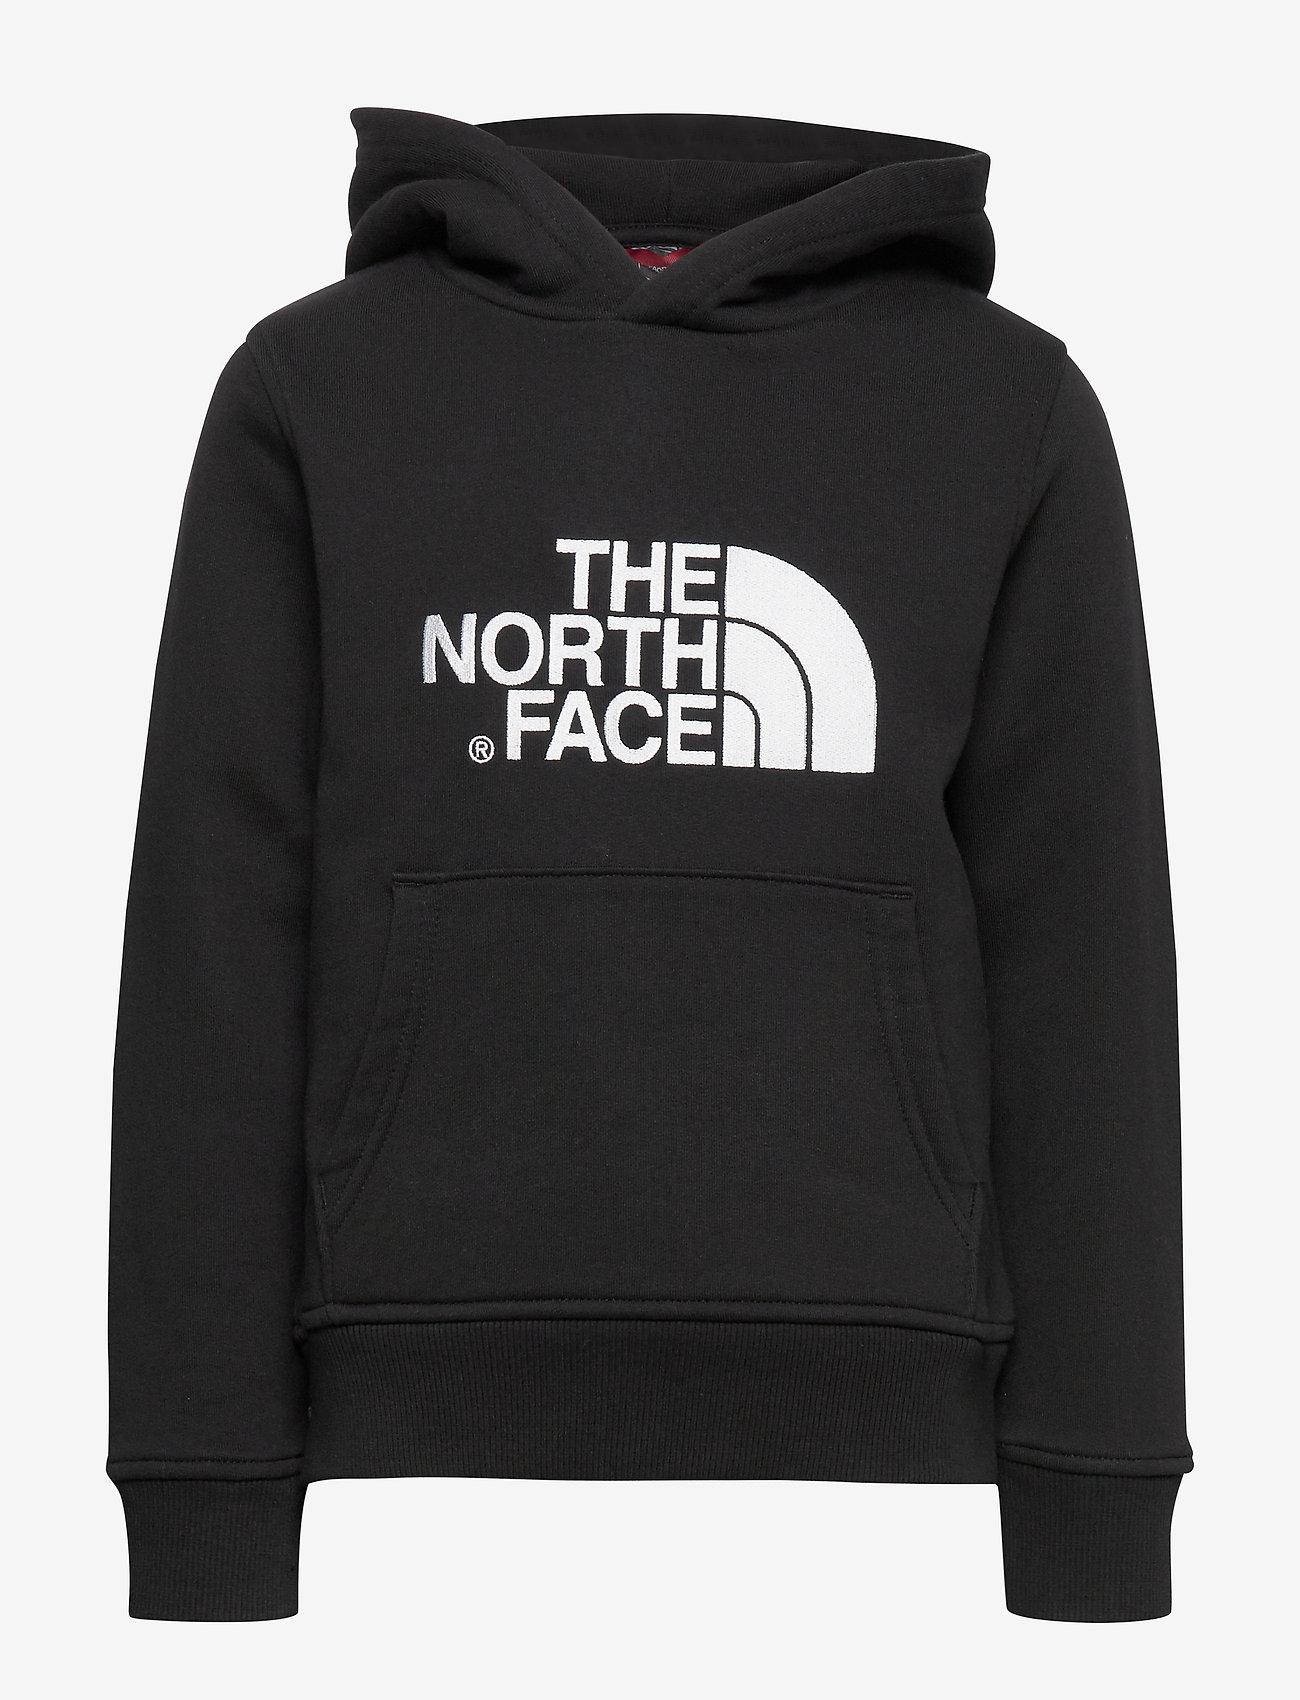 The North Face - Y DREW PEAK P/O HD - kapuzenpullover - tnf black-tnf black - 0